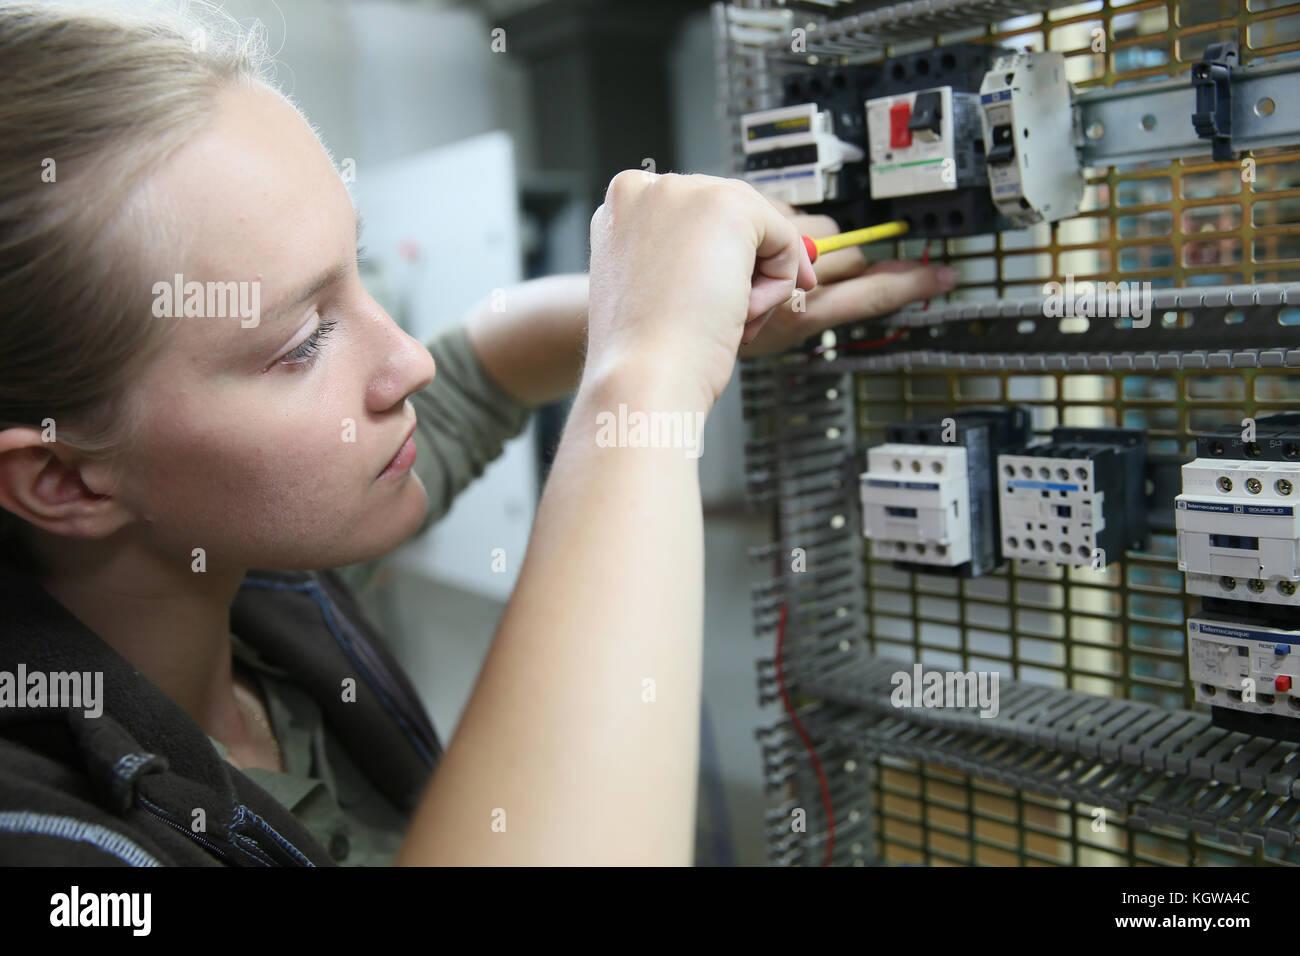 Mujer joven en formación profesional configuración de circuito eléctrico Imagen De Stock